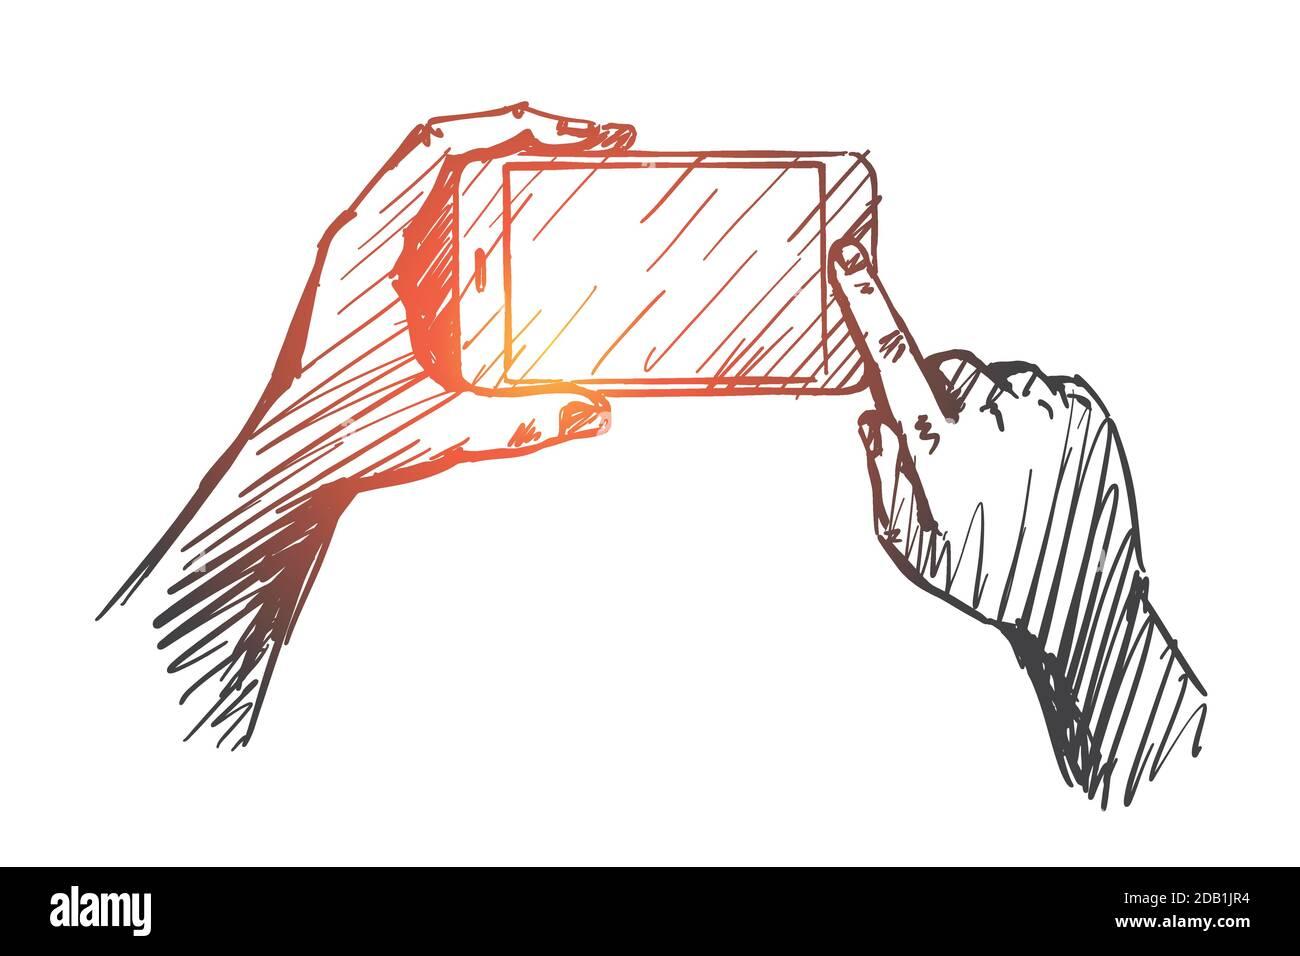 Hand drawn gadget in human hands Stock Vector